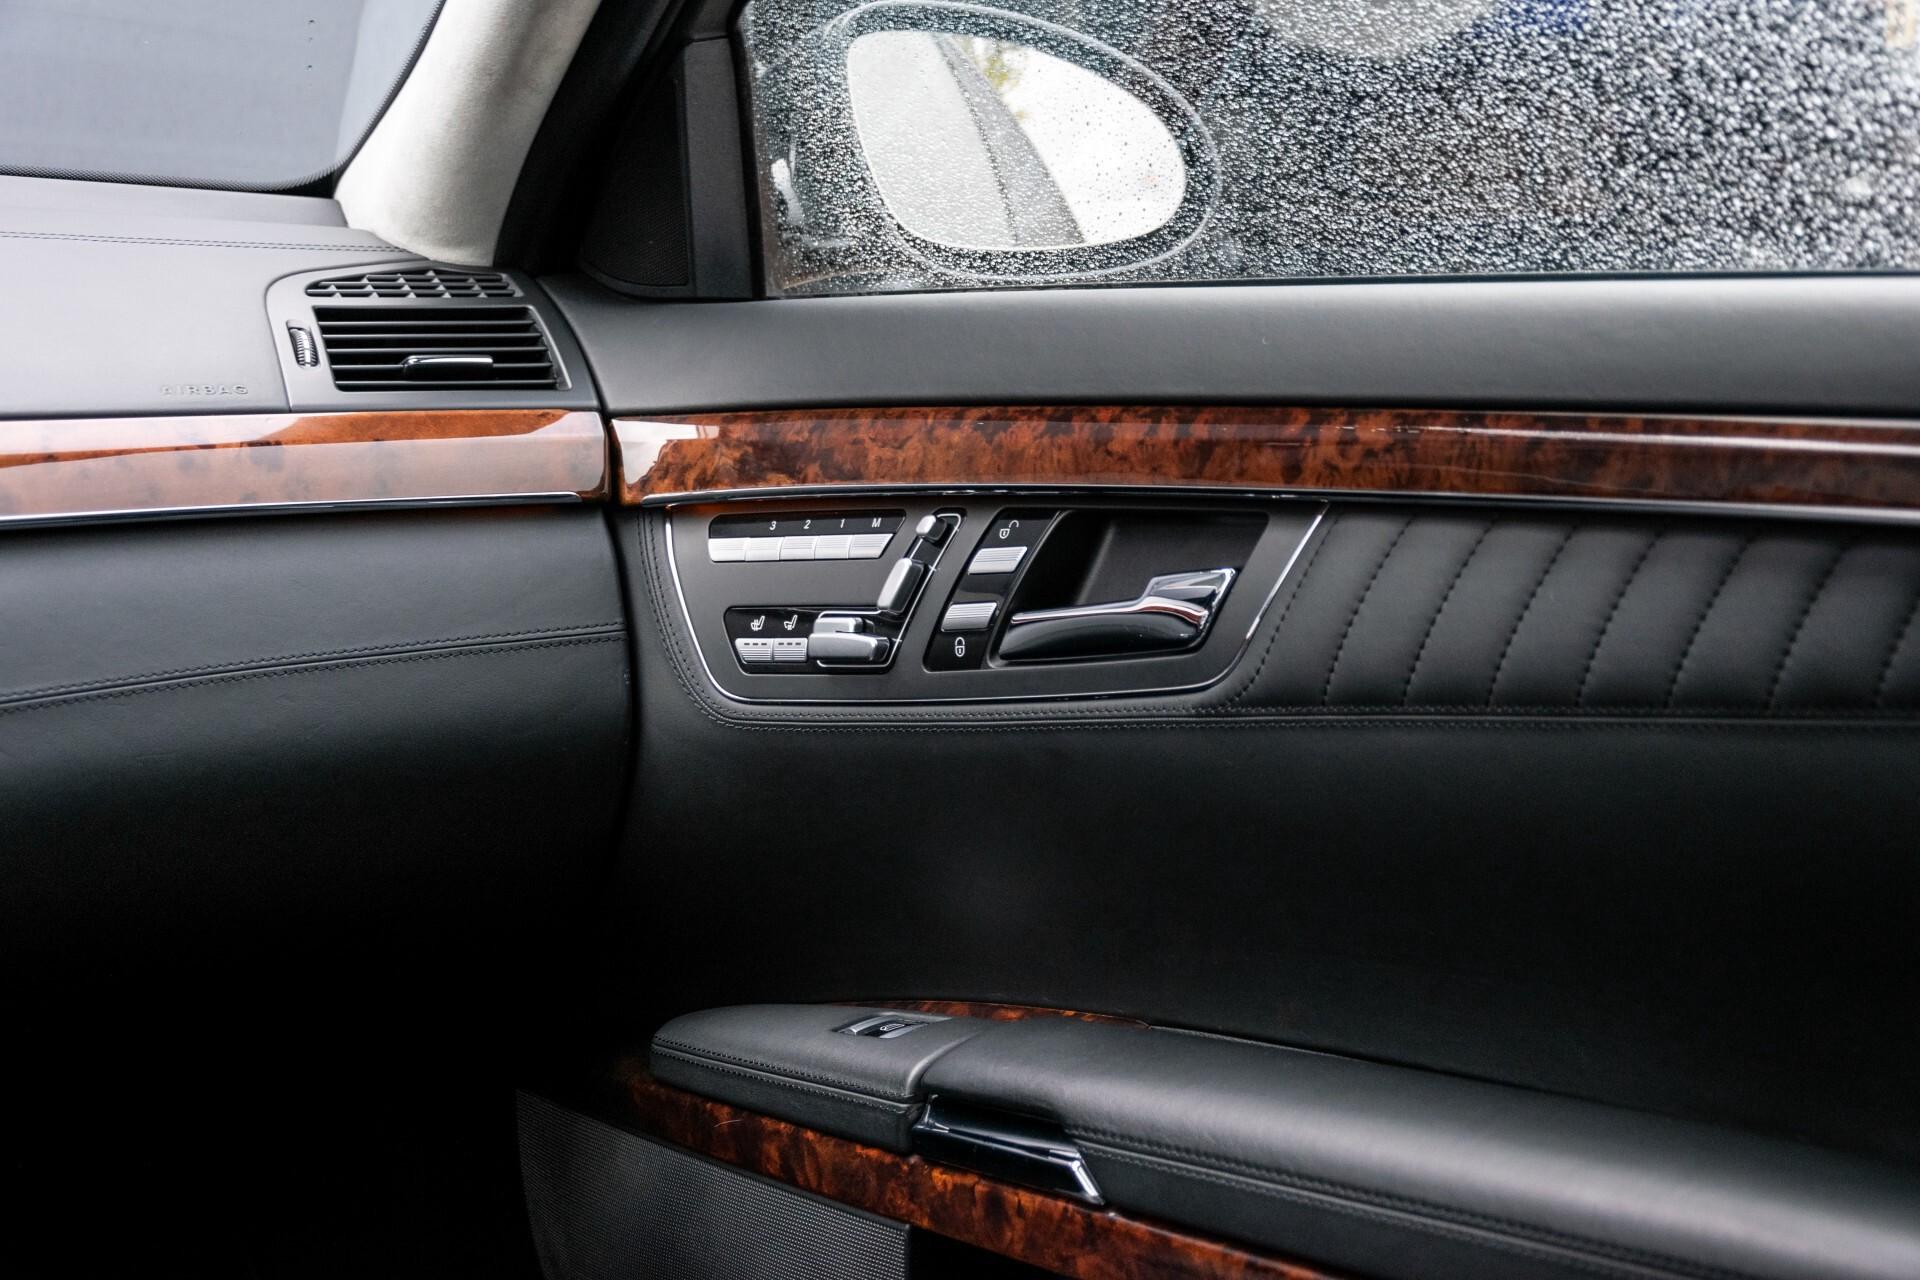 Mercedes-Benz S-Klasse 600 Lang 65 AMG Bi-Turbo Prestige Plus Aut5 Foto 55